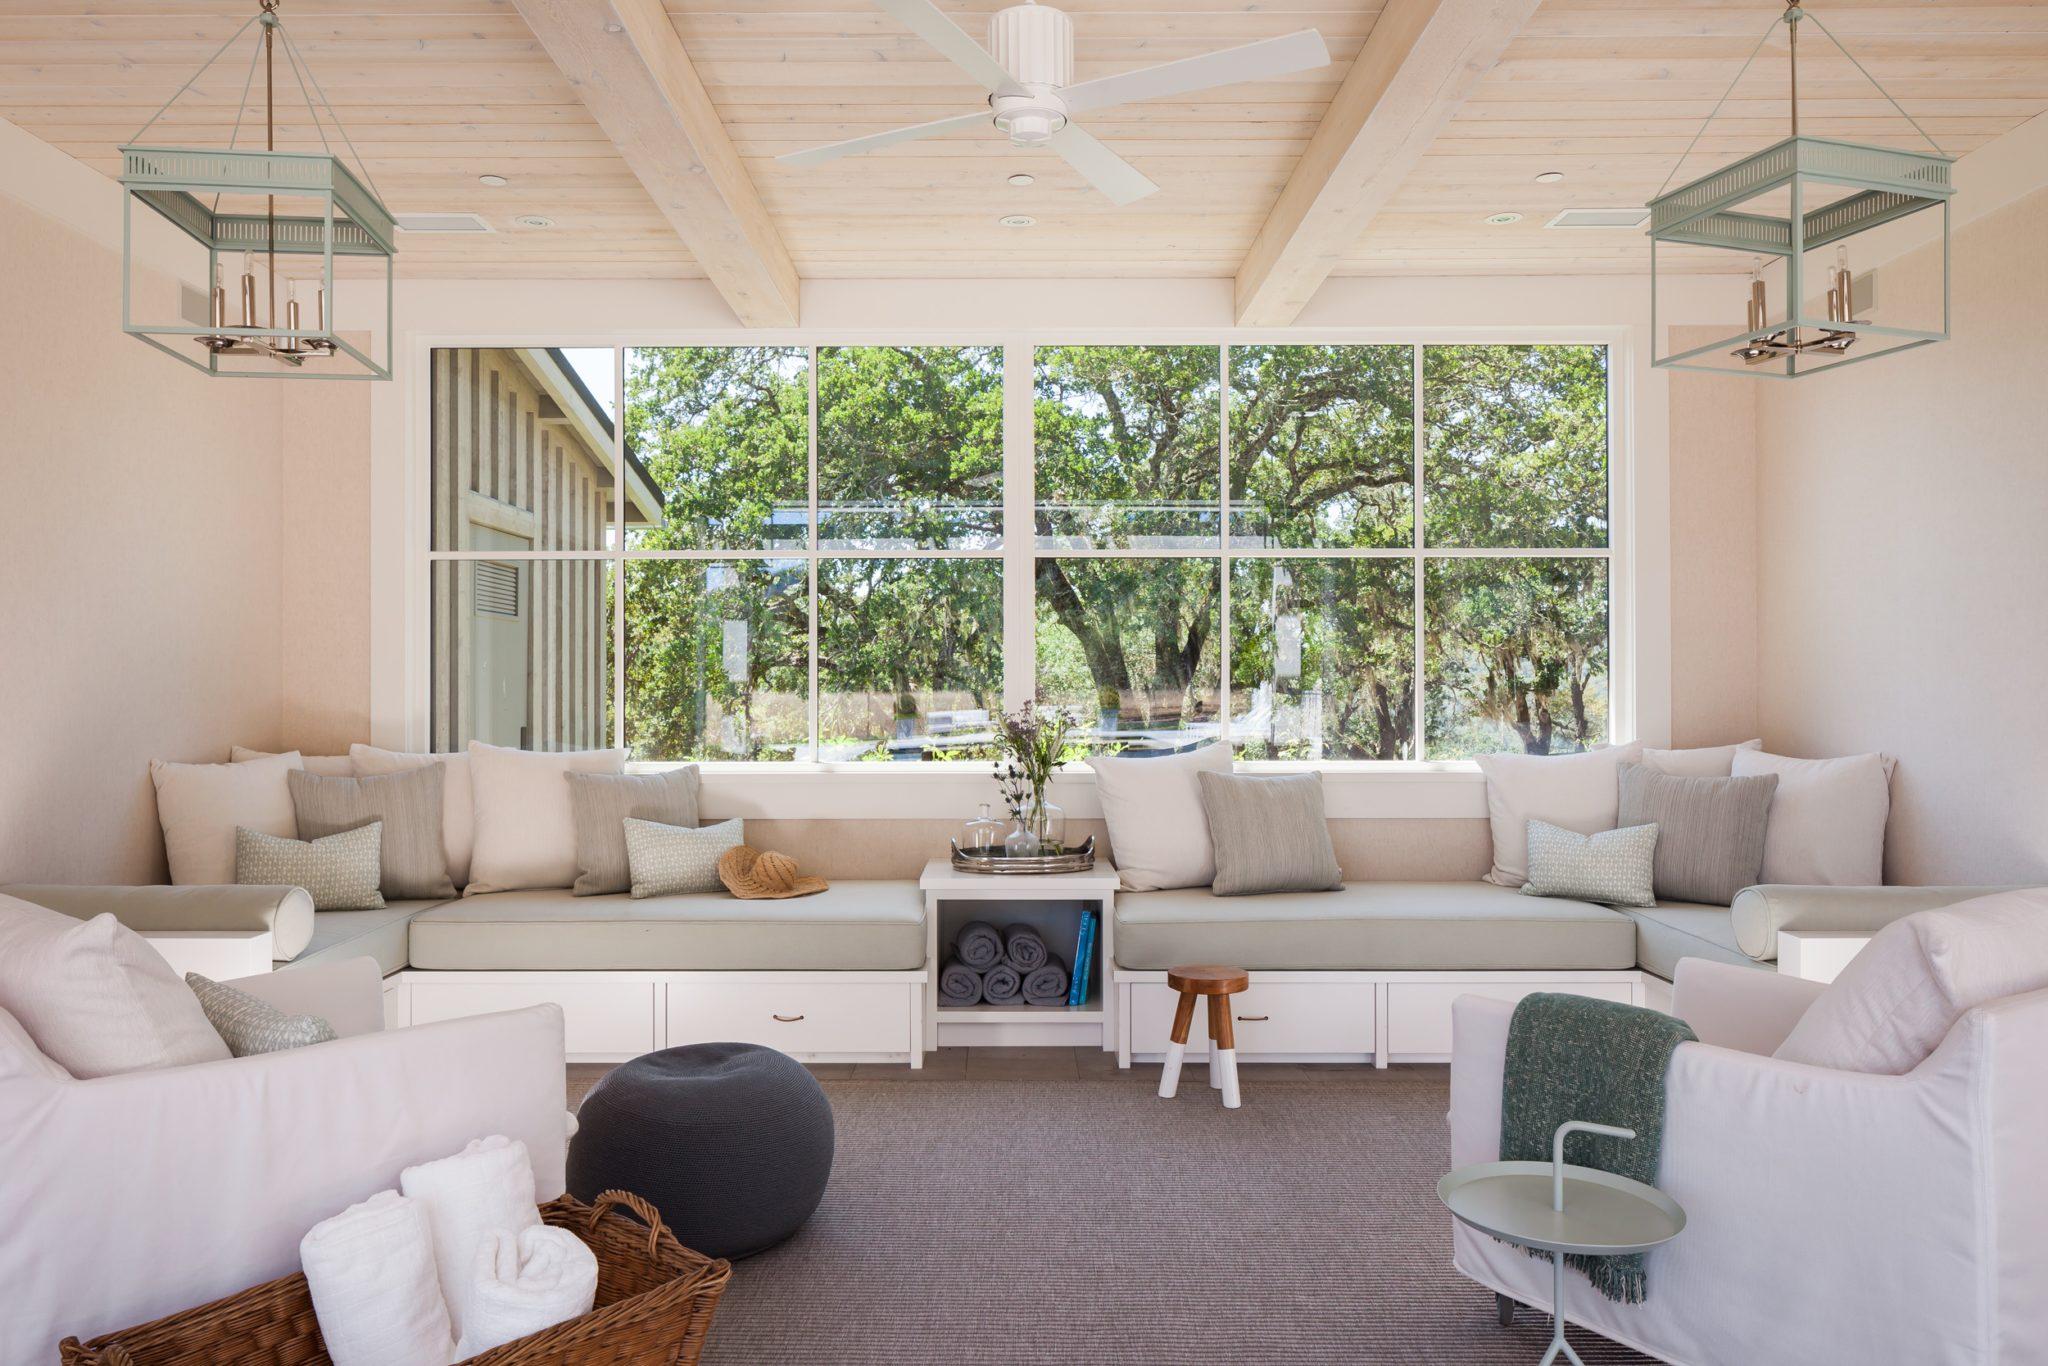 Sonoma, California- pool house sunroom by BK Interior Design